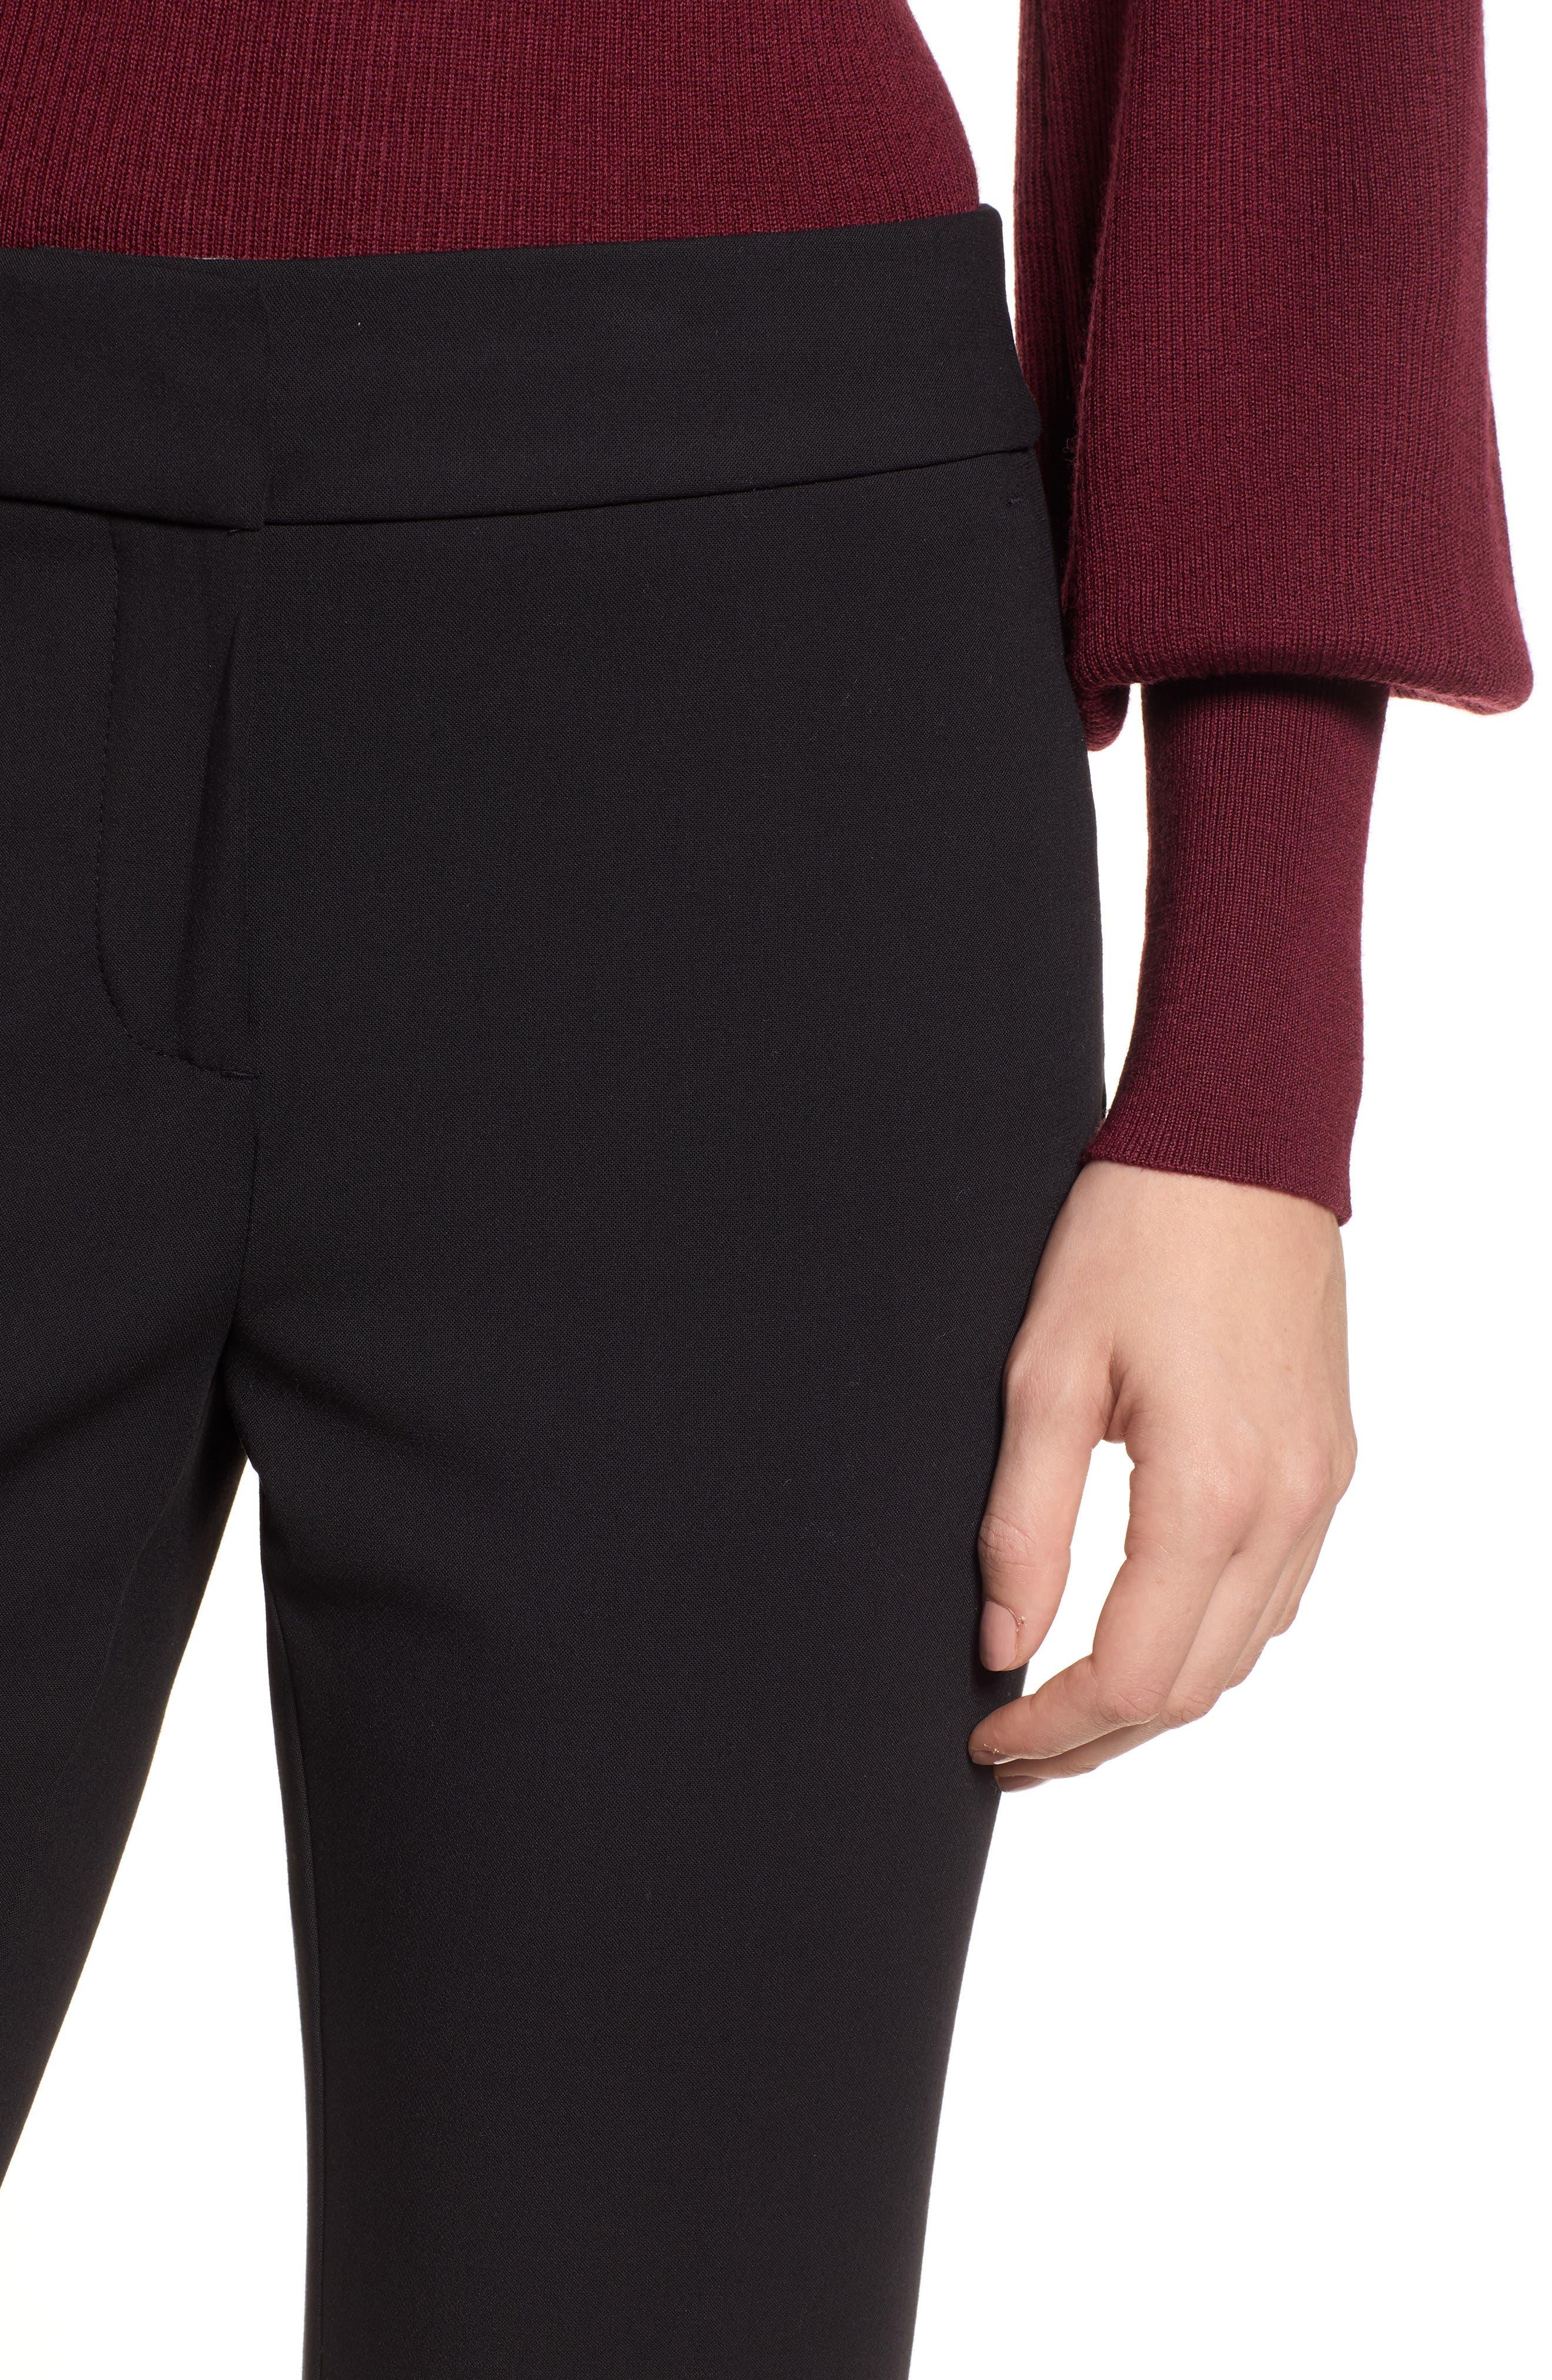 Edie Full Length Trouser in Four-Season Stretch,                             Alternate thumbnail 4, color,                             001